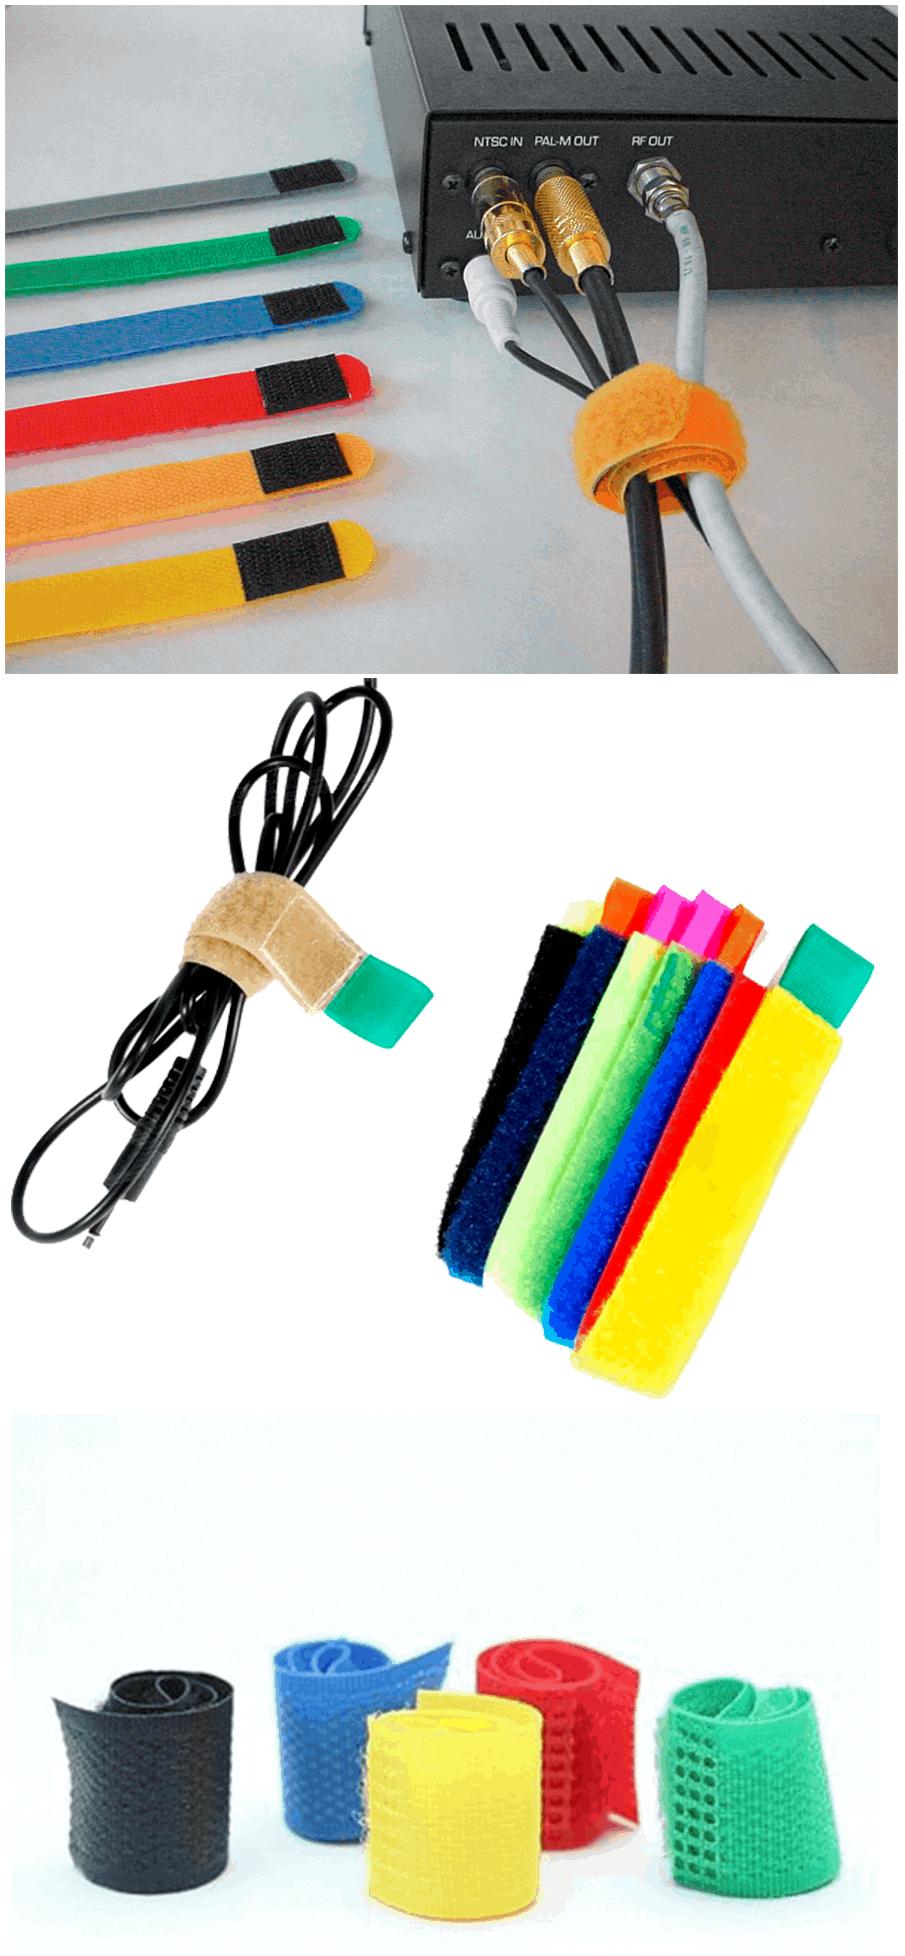 esconder e organizar fios e cabos